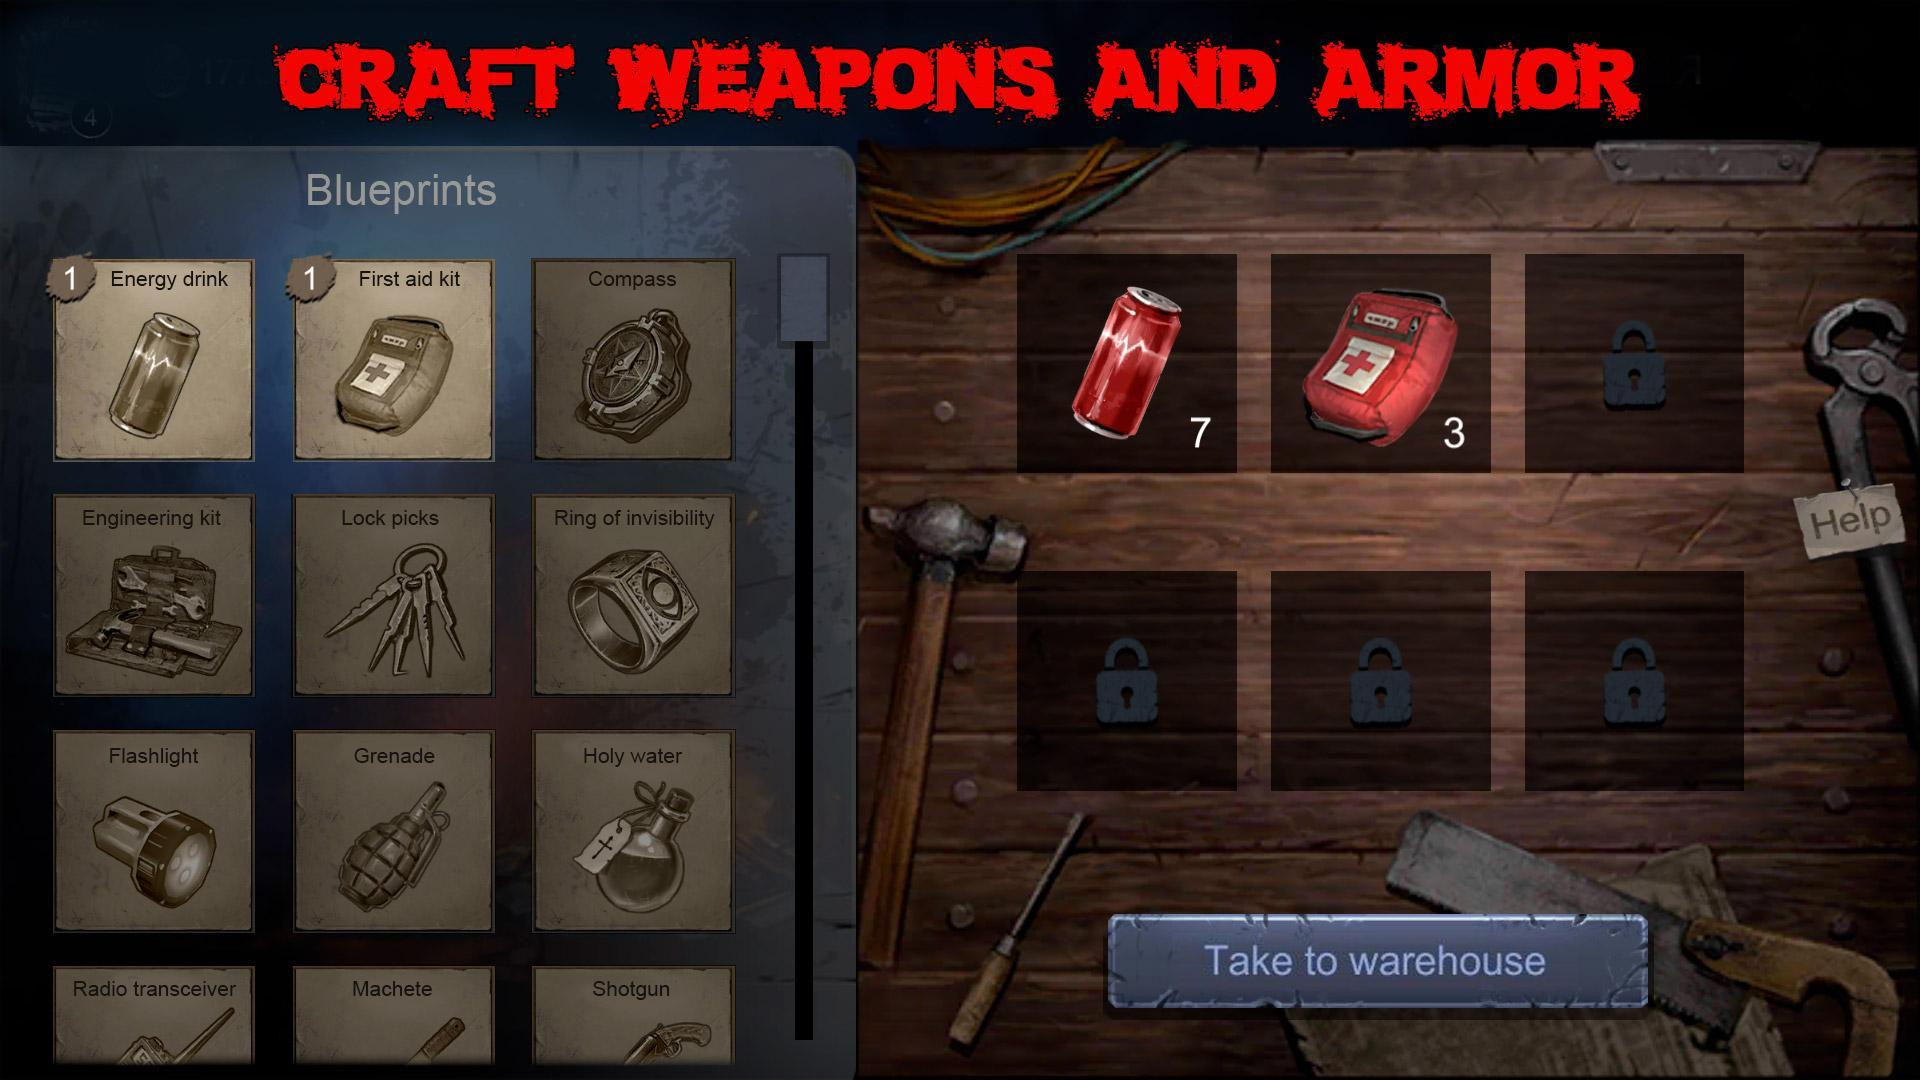 Horrorfield Multiplayer Survival Horror Game 1.3.6 Screenshot 17